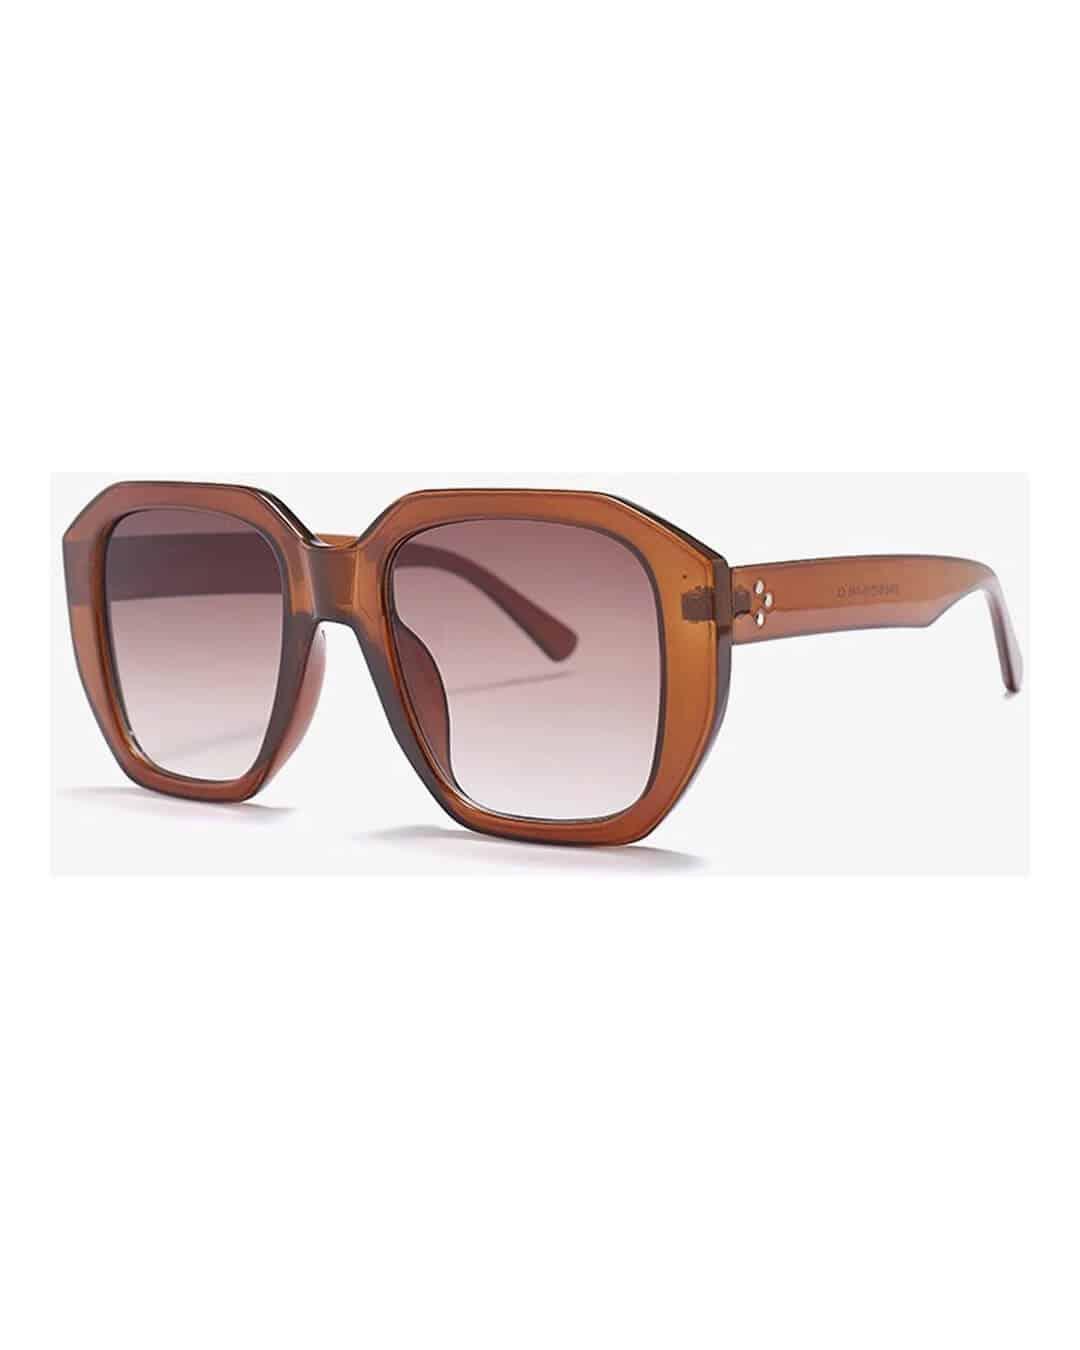 Ming-Shades-Colour-Brown-2